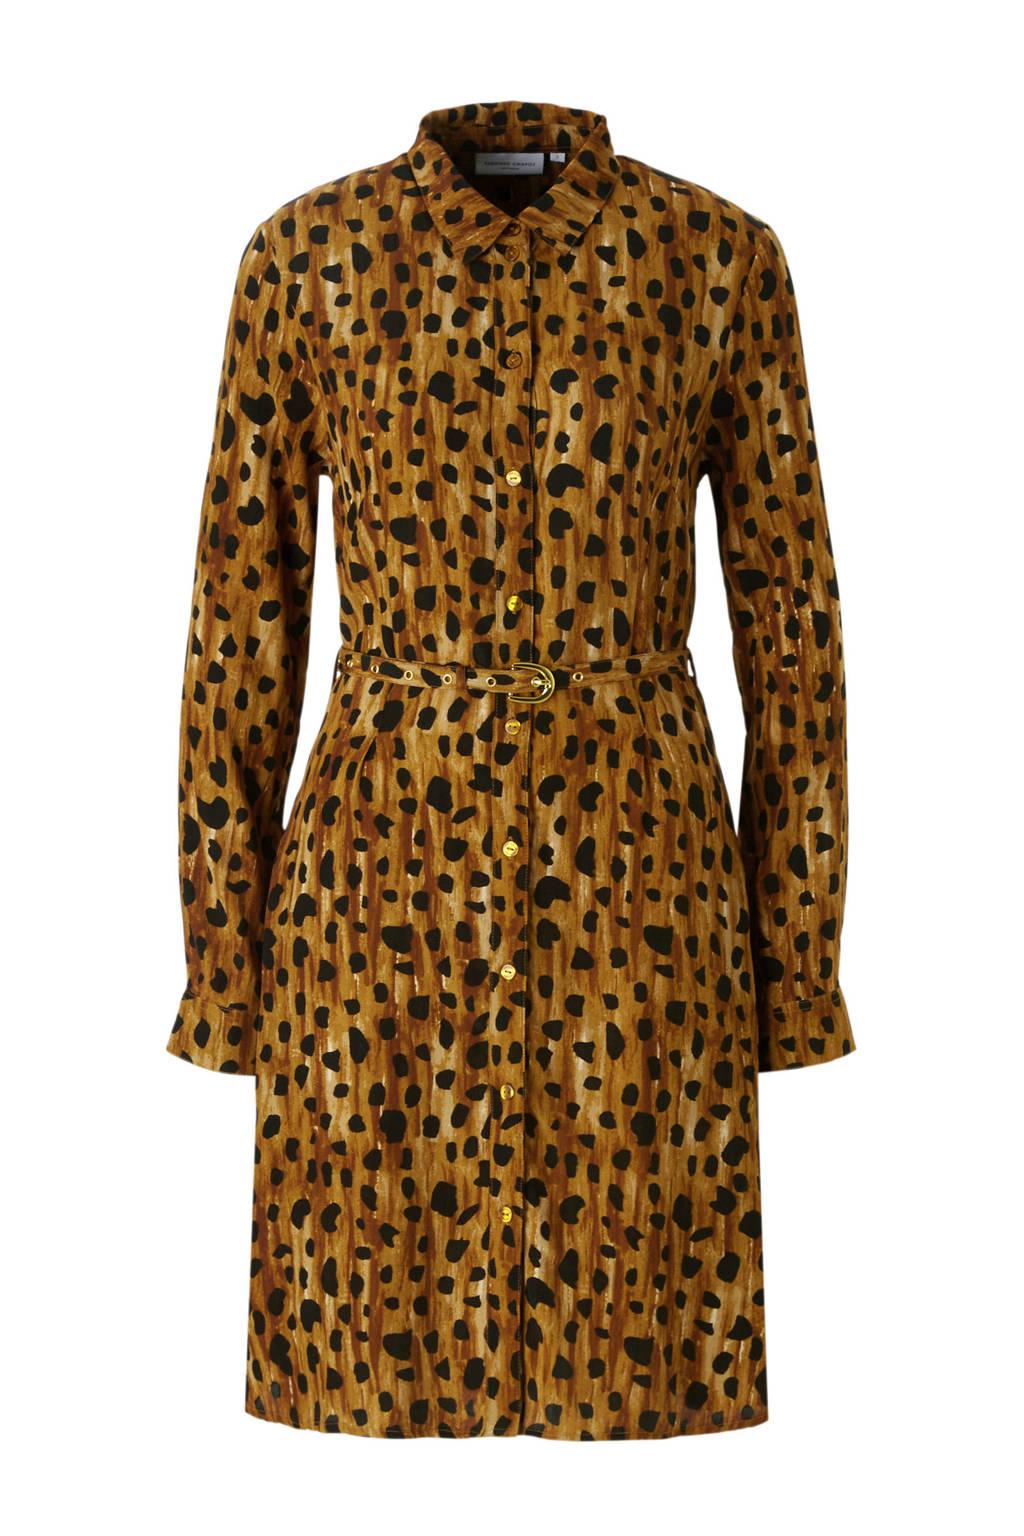 Fabienne Chapot Hayley rose jurk met cheetah print, Bruin/zwart